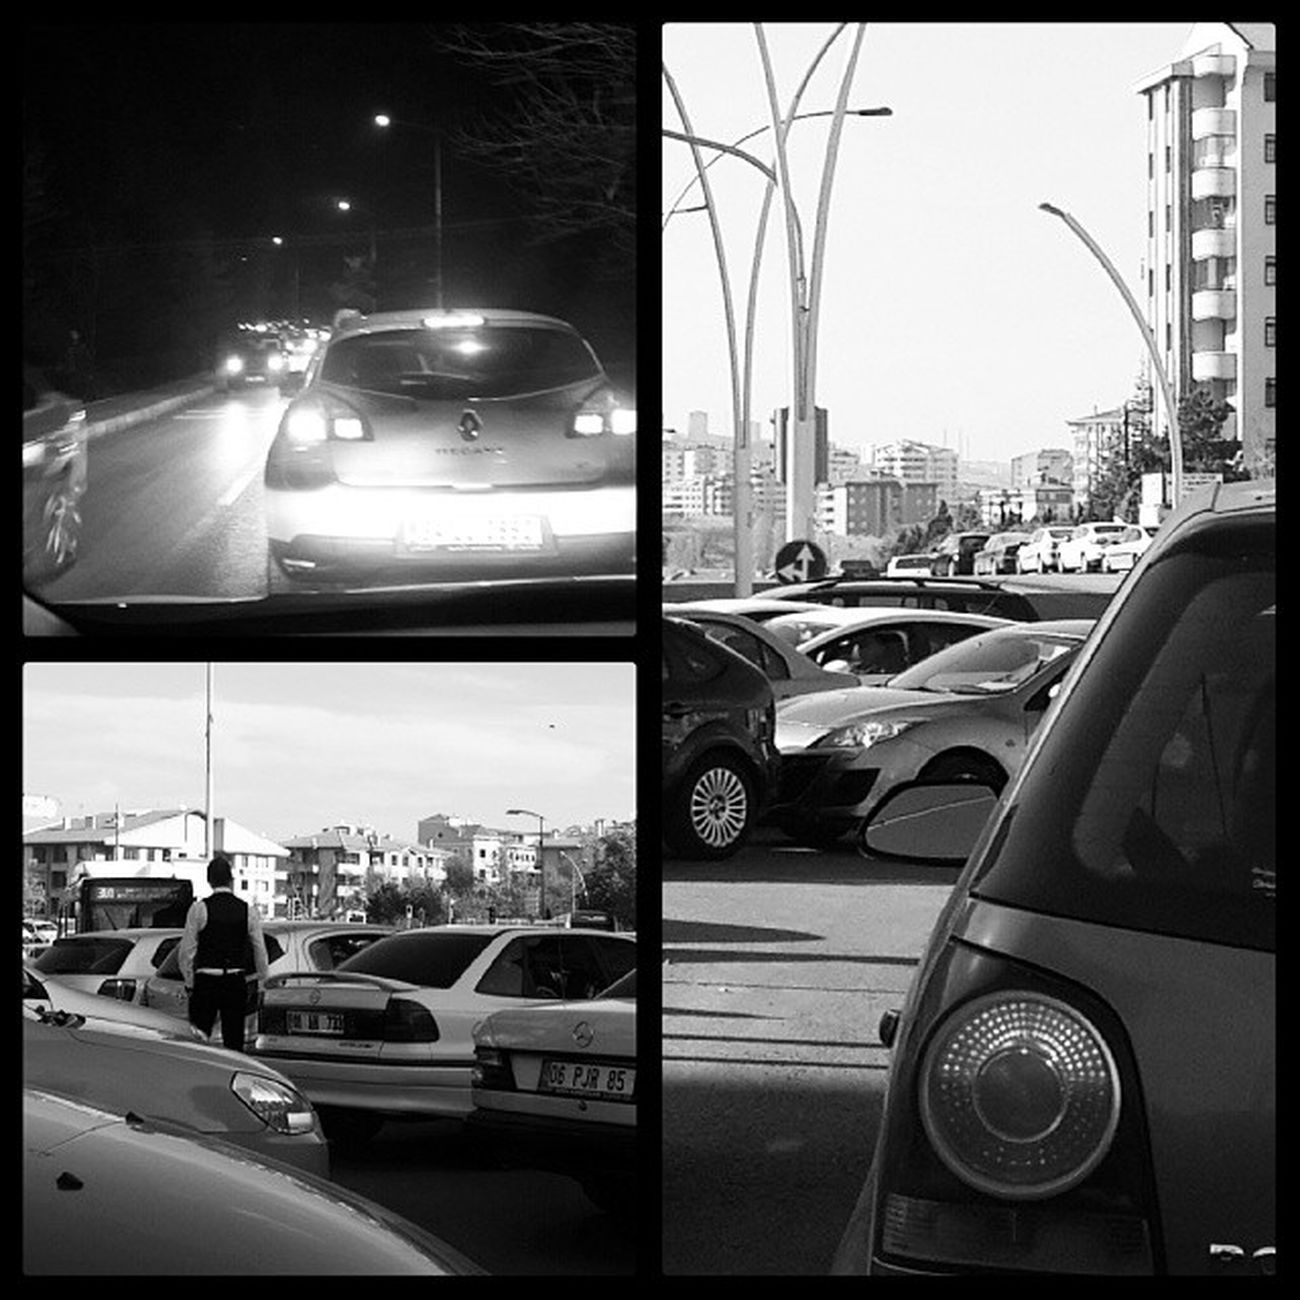 Ankarada trafik keyfiiiii ? Ankara Trafik Odtuyolu Nowayout stuck waiting bw instaanger